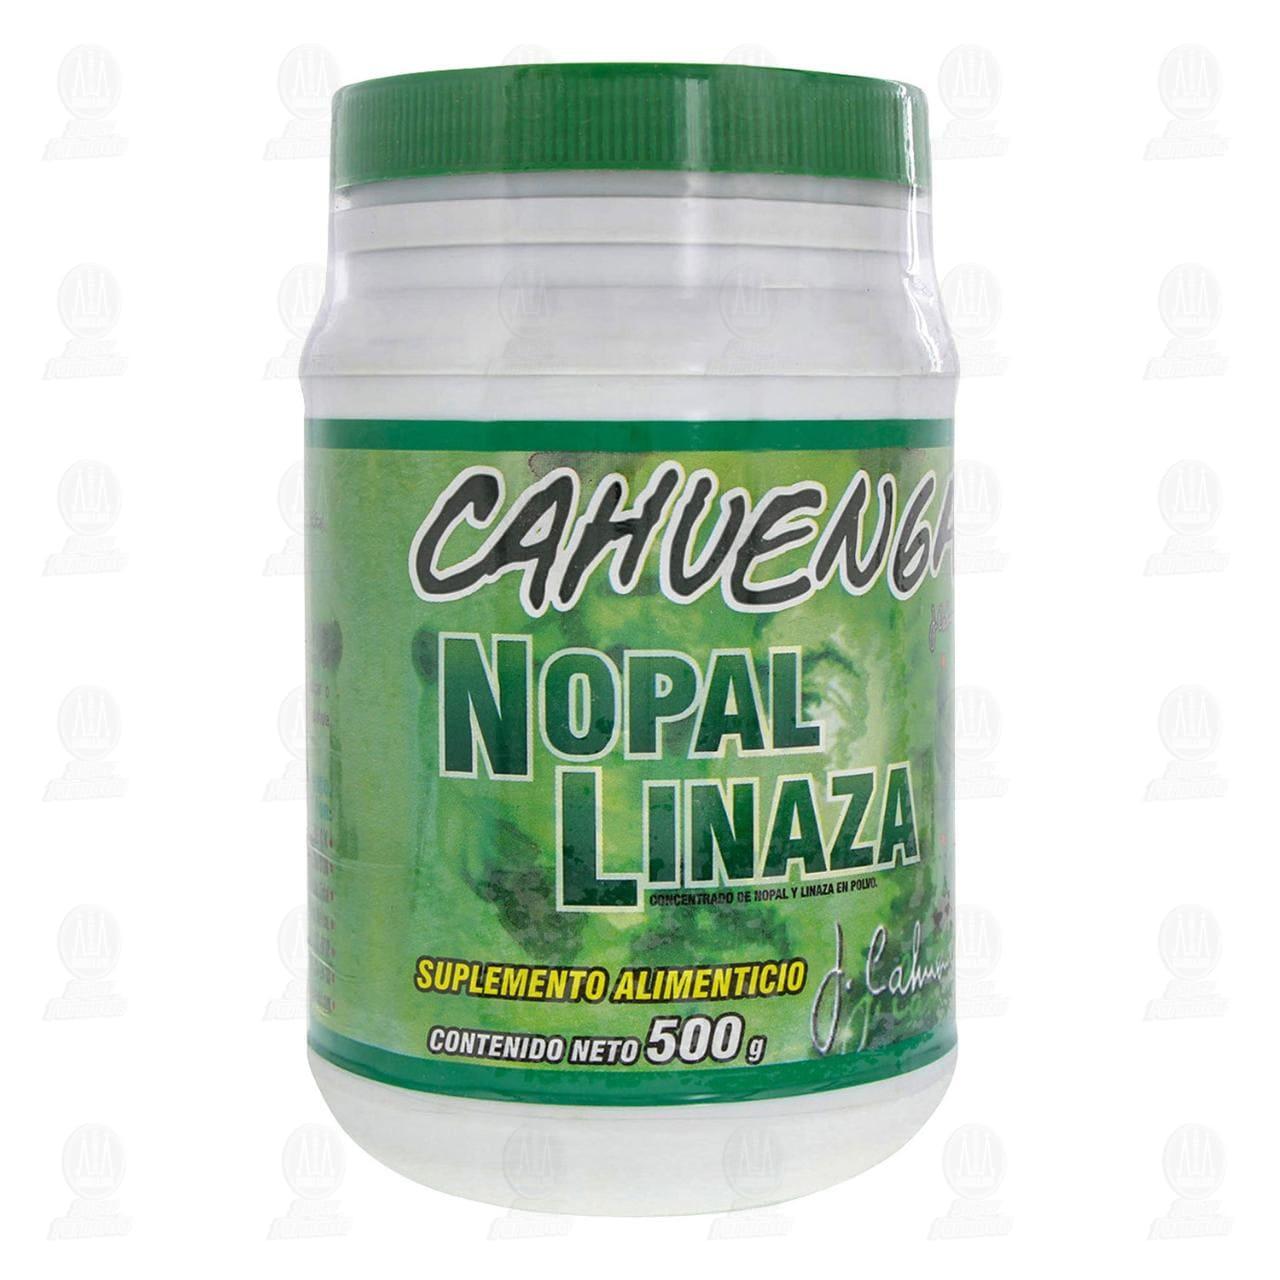 Comprar Cahuenga 500gr Nopal Linaza en Farmacias Guadalajara